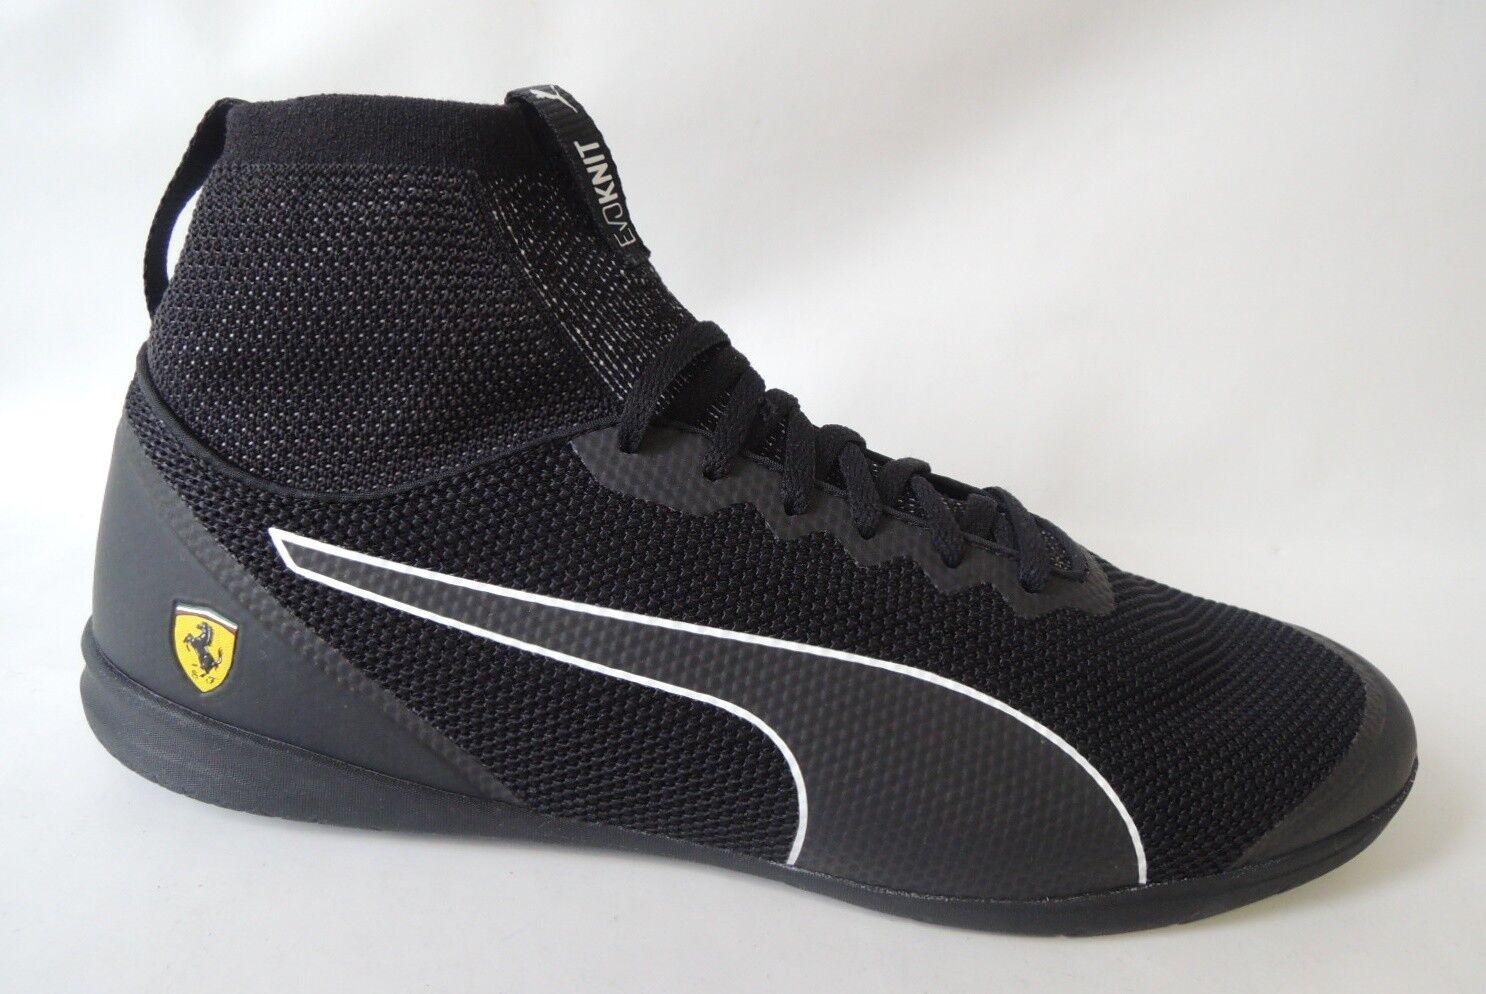 NEU Puma SF Changer Ignite Evoknit Ferrari 44 Socken Socken Socken Schuhe Sneaker 305919-02 d5be05